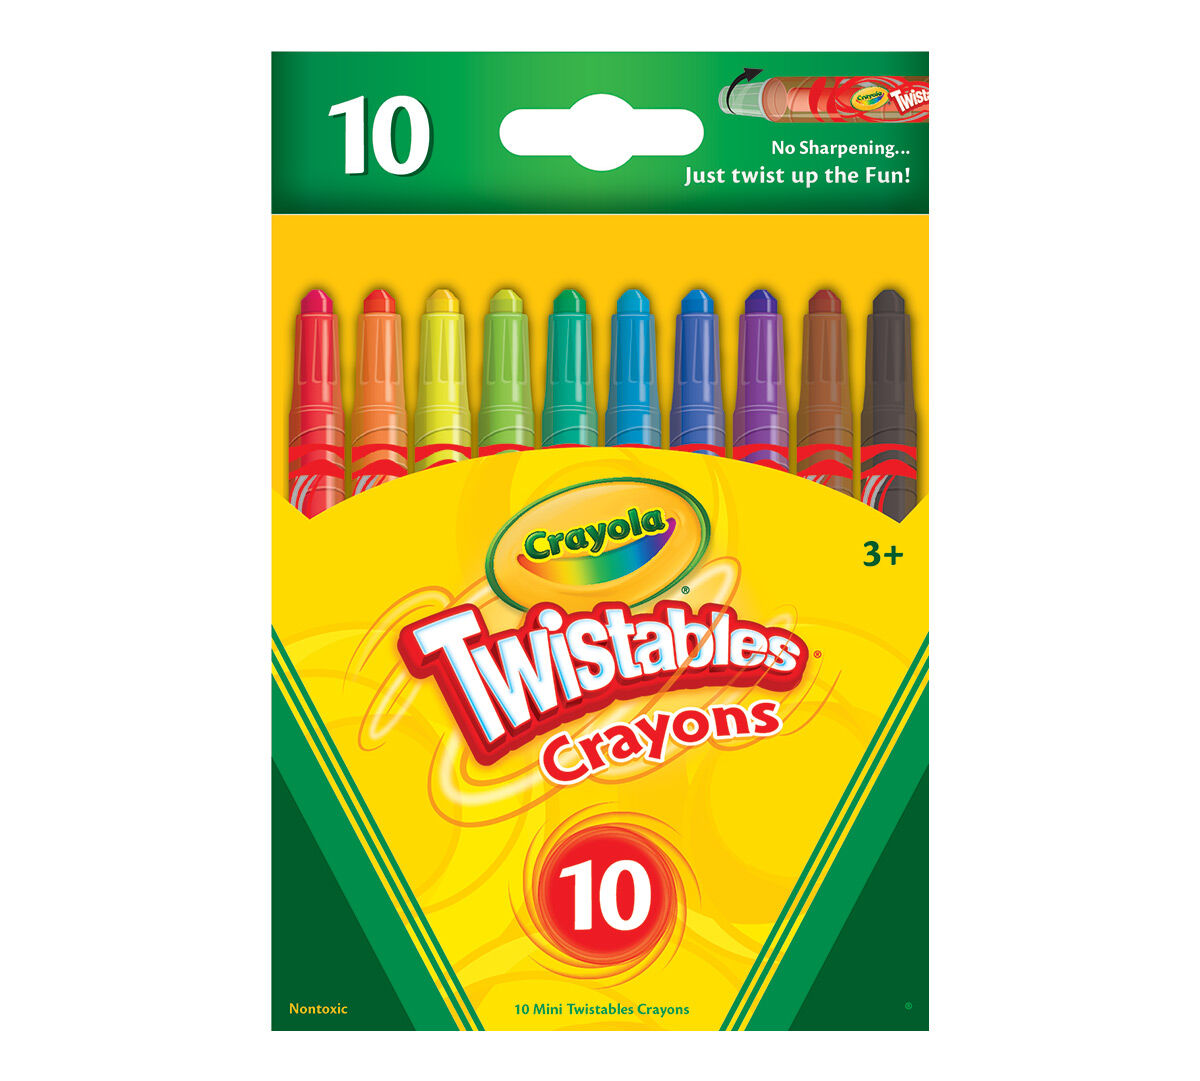 Mini Twistable Crayons 10 ct.